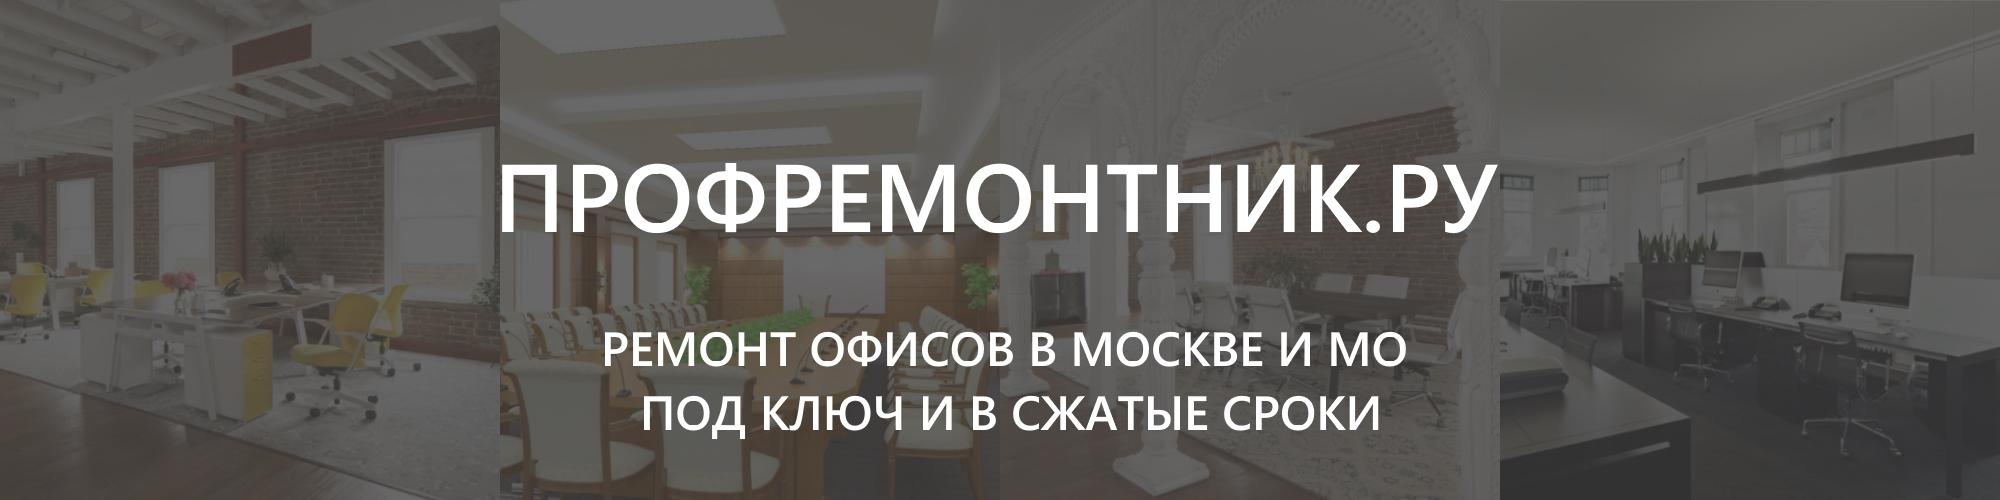 remont-ofisov-moskva-oblast